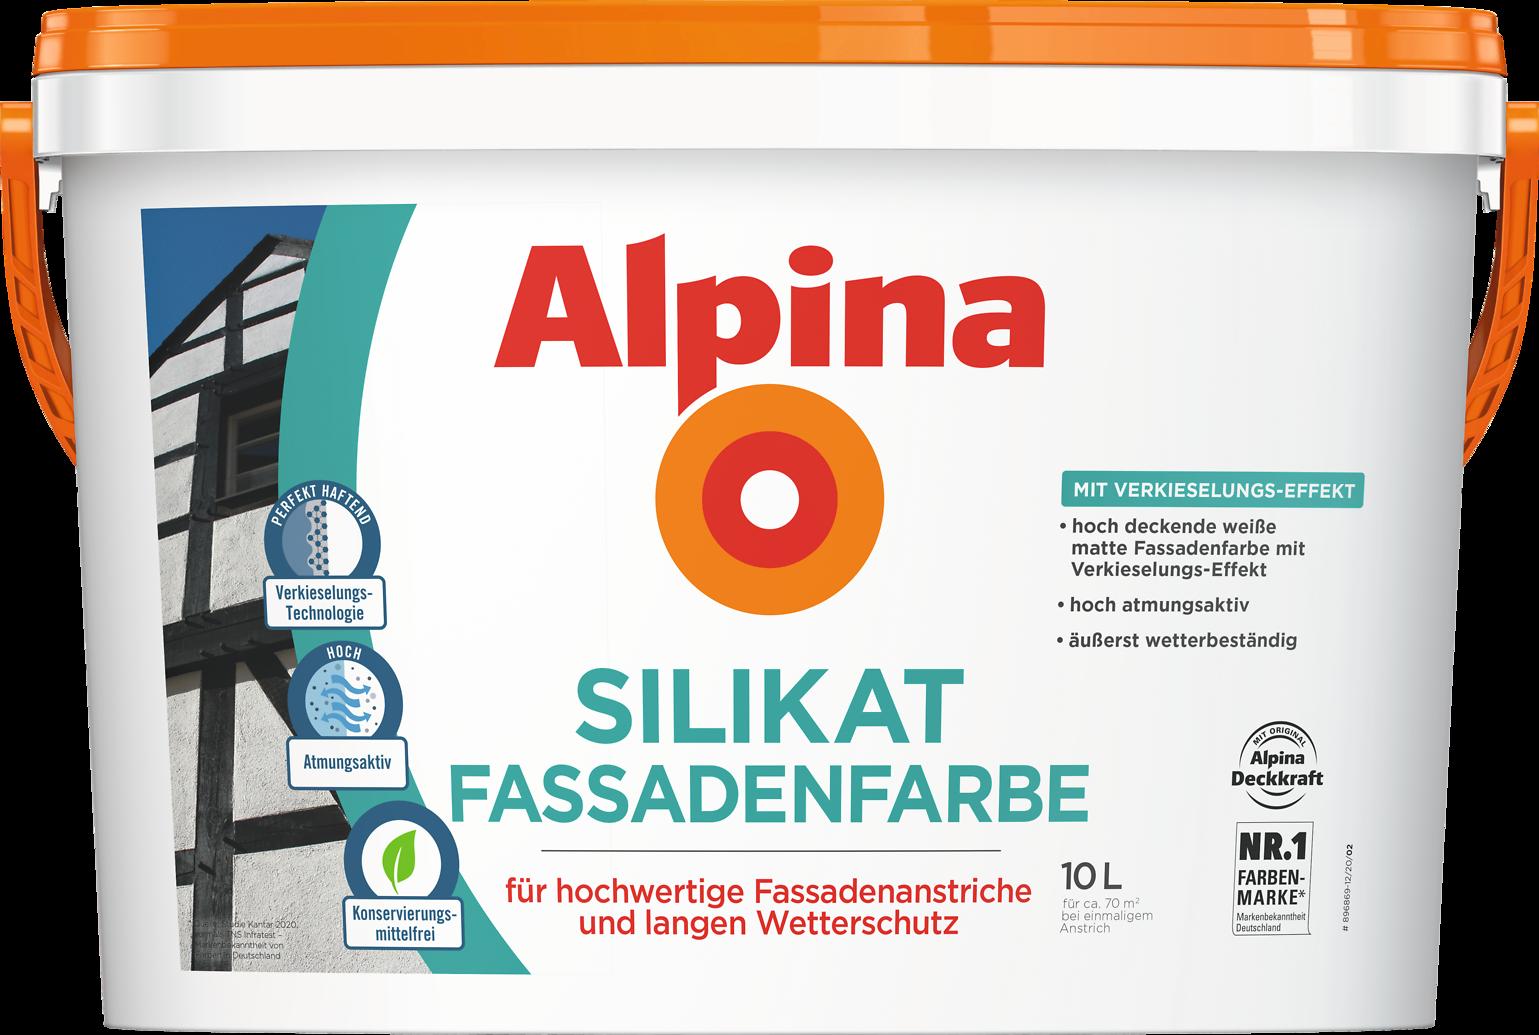 Alpina Silikat-Fassadenfarbe mitVerkieselungs-Effekt ...